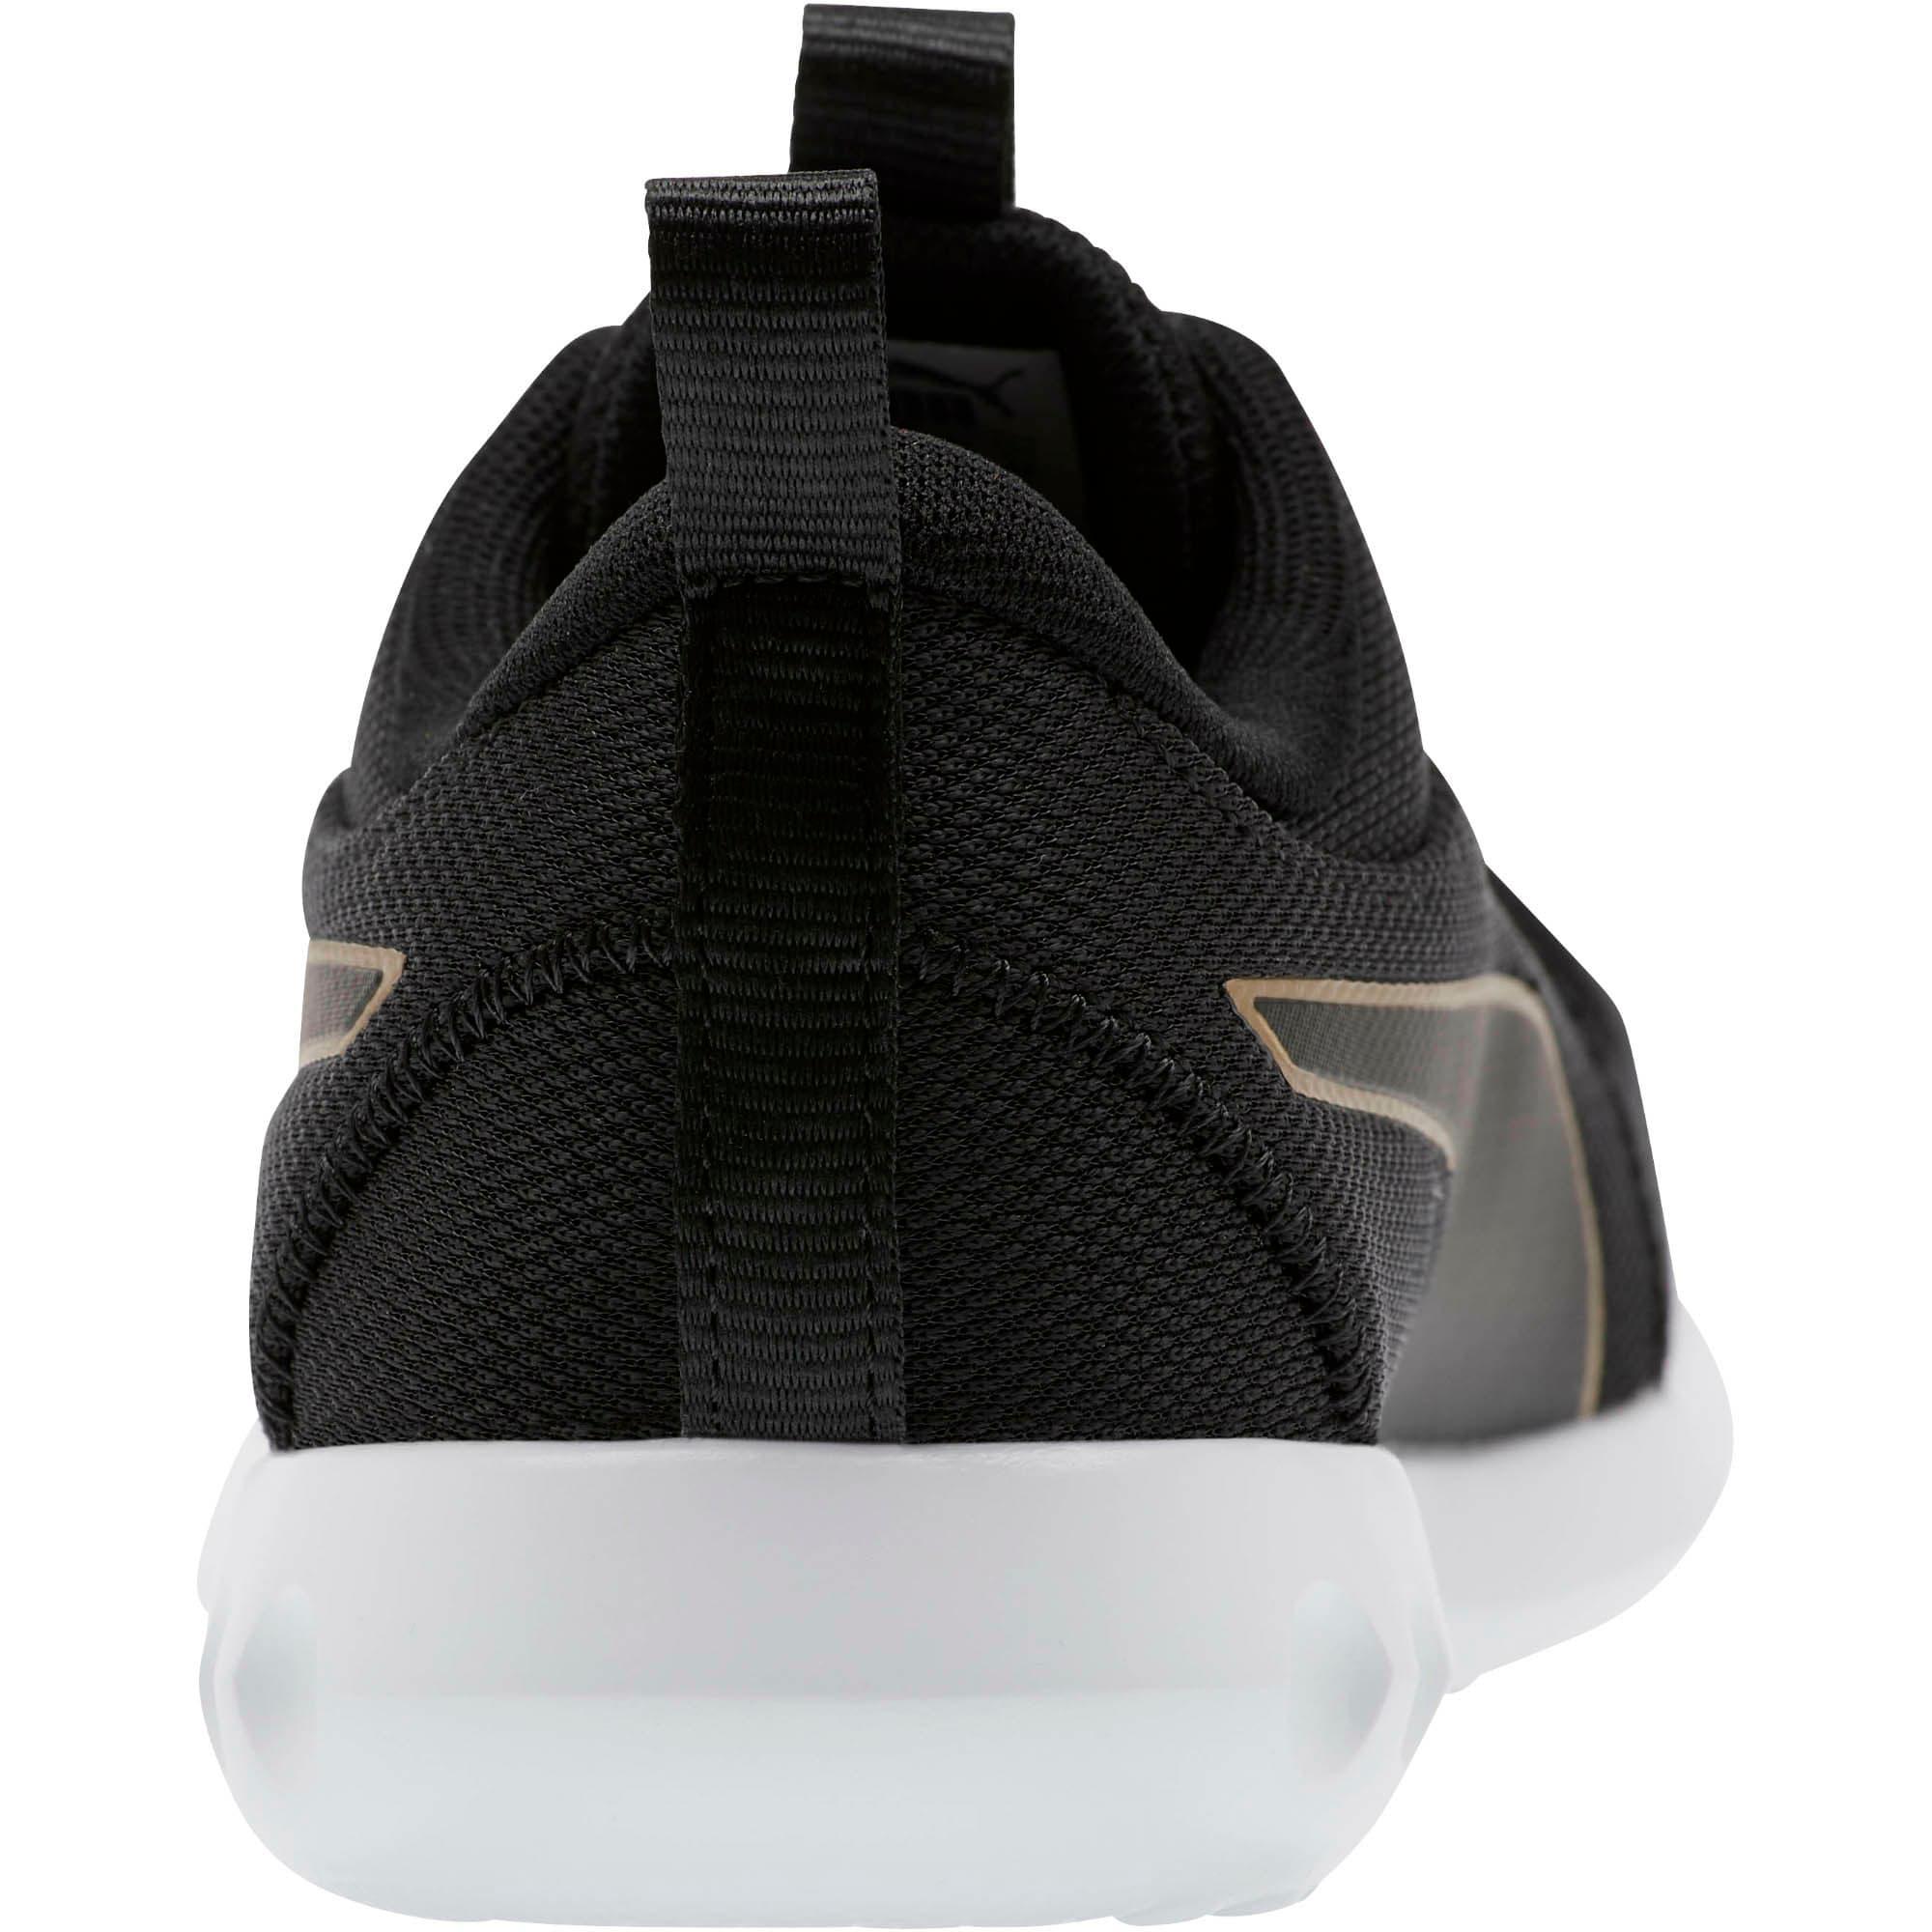 Thumbnail 3 of Carson 2 Cosmo Women's Running Shoes, Puma Black-Metallic Gold, medium